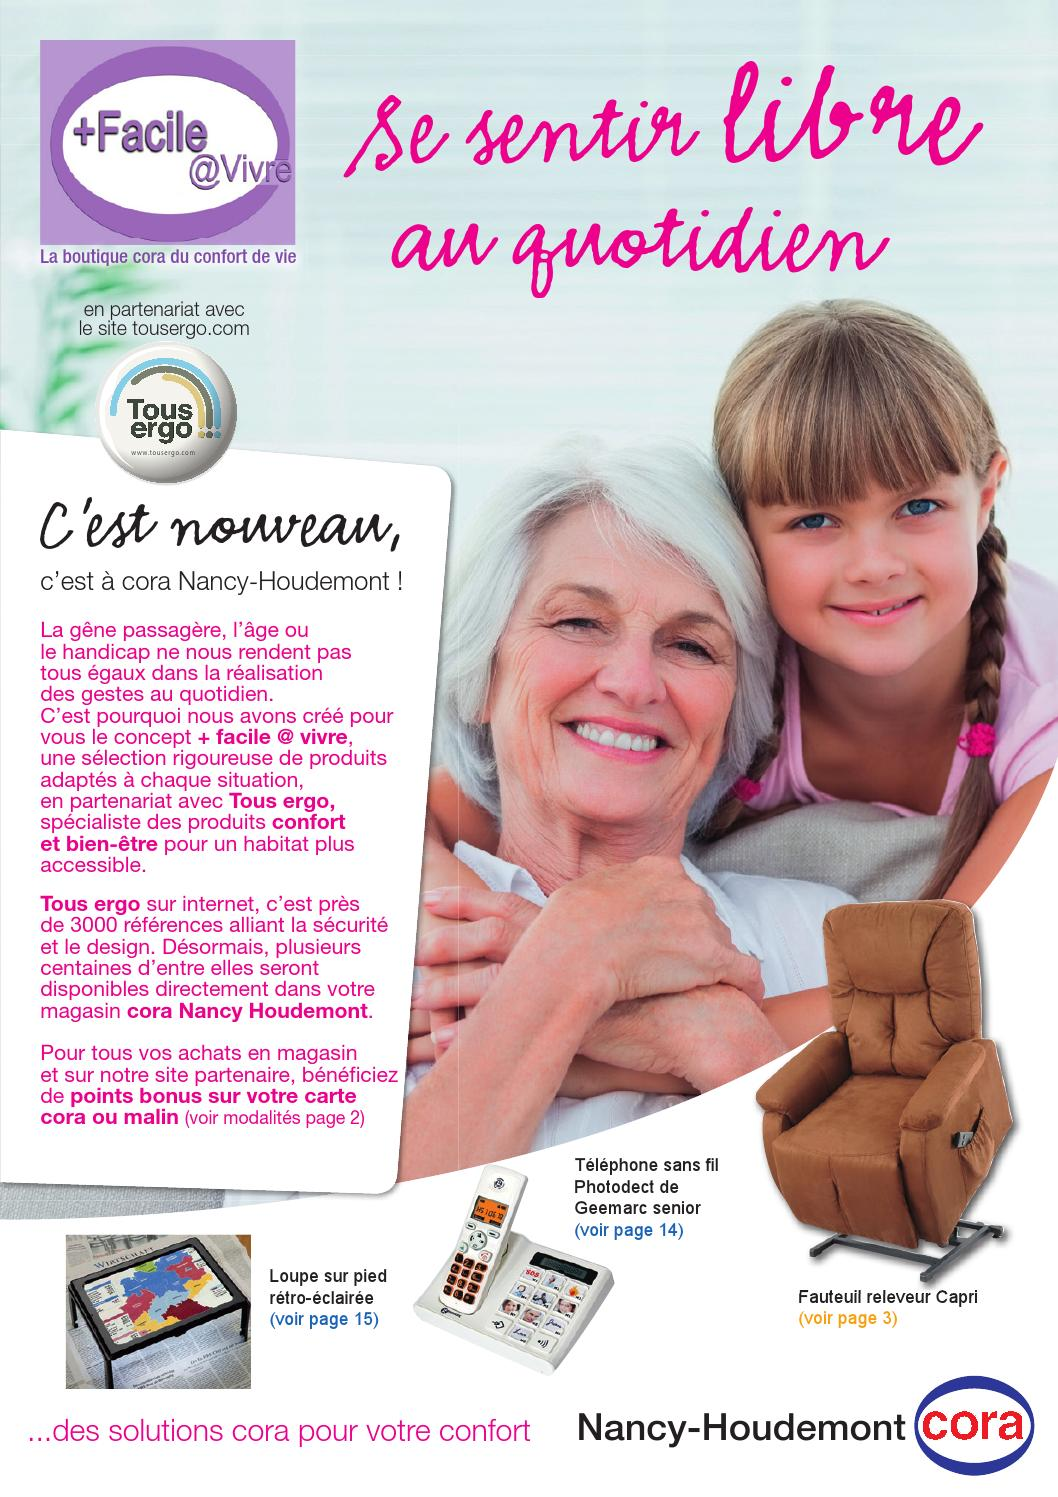 Calendrier Carte Cora Houdemont.Catalogue Cora Du 19 Mars Au 30 Juin By Anti Crise Fr Issuu